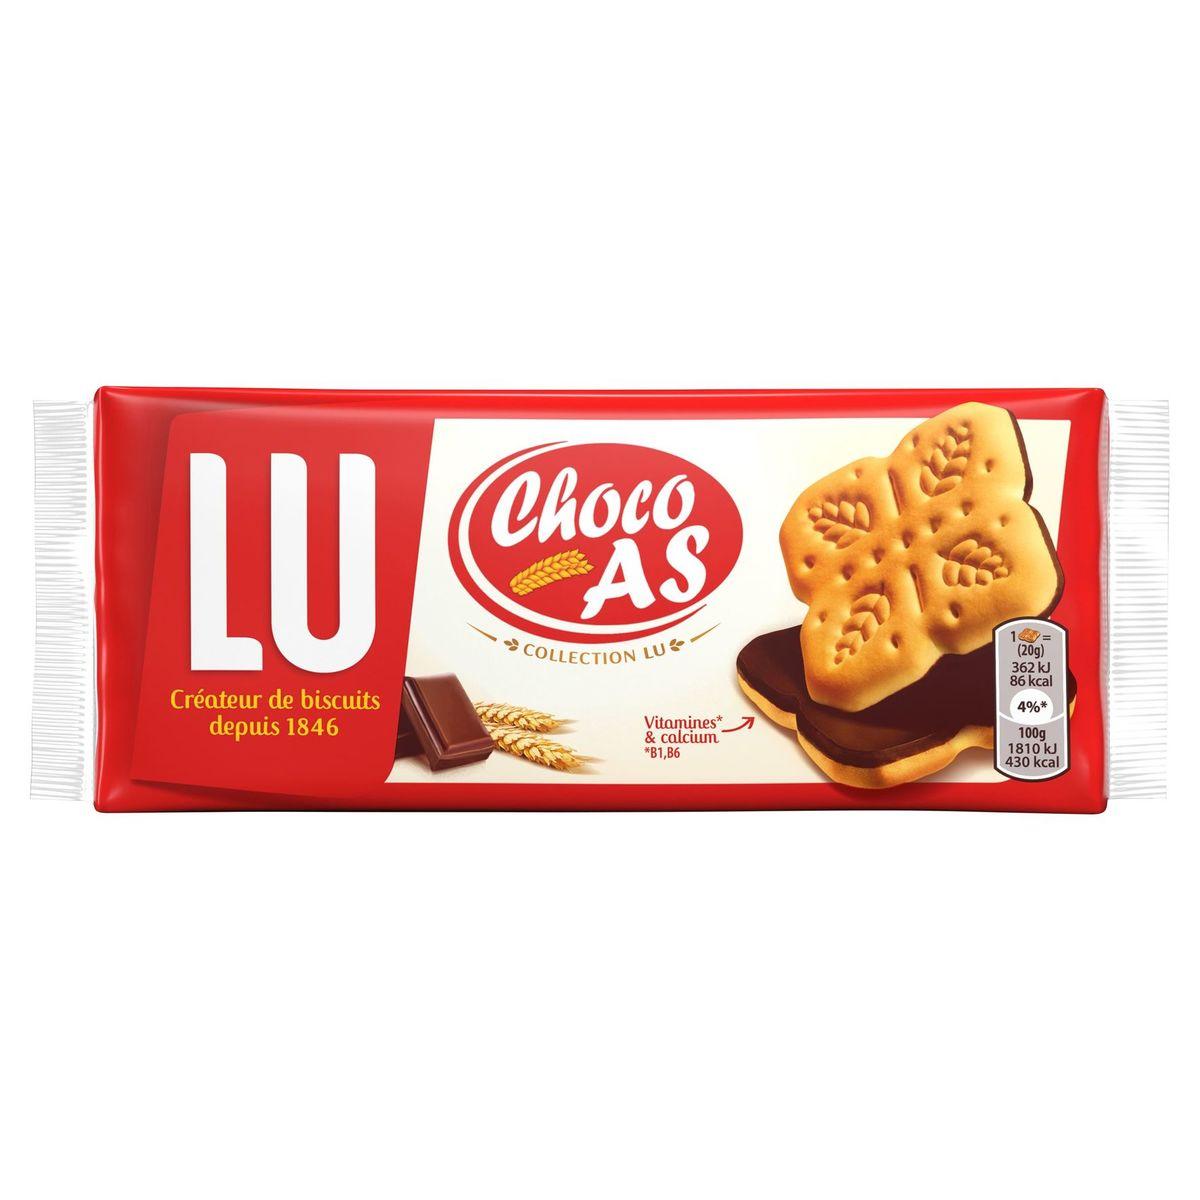 LU Choco As Original 240 g